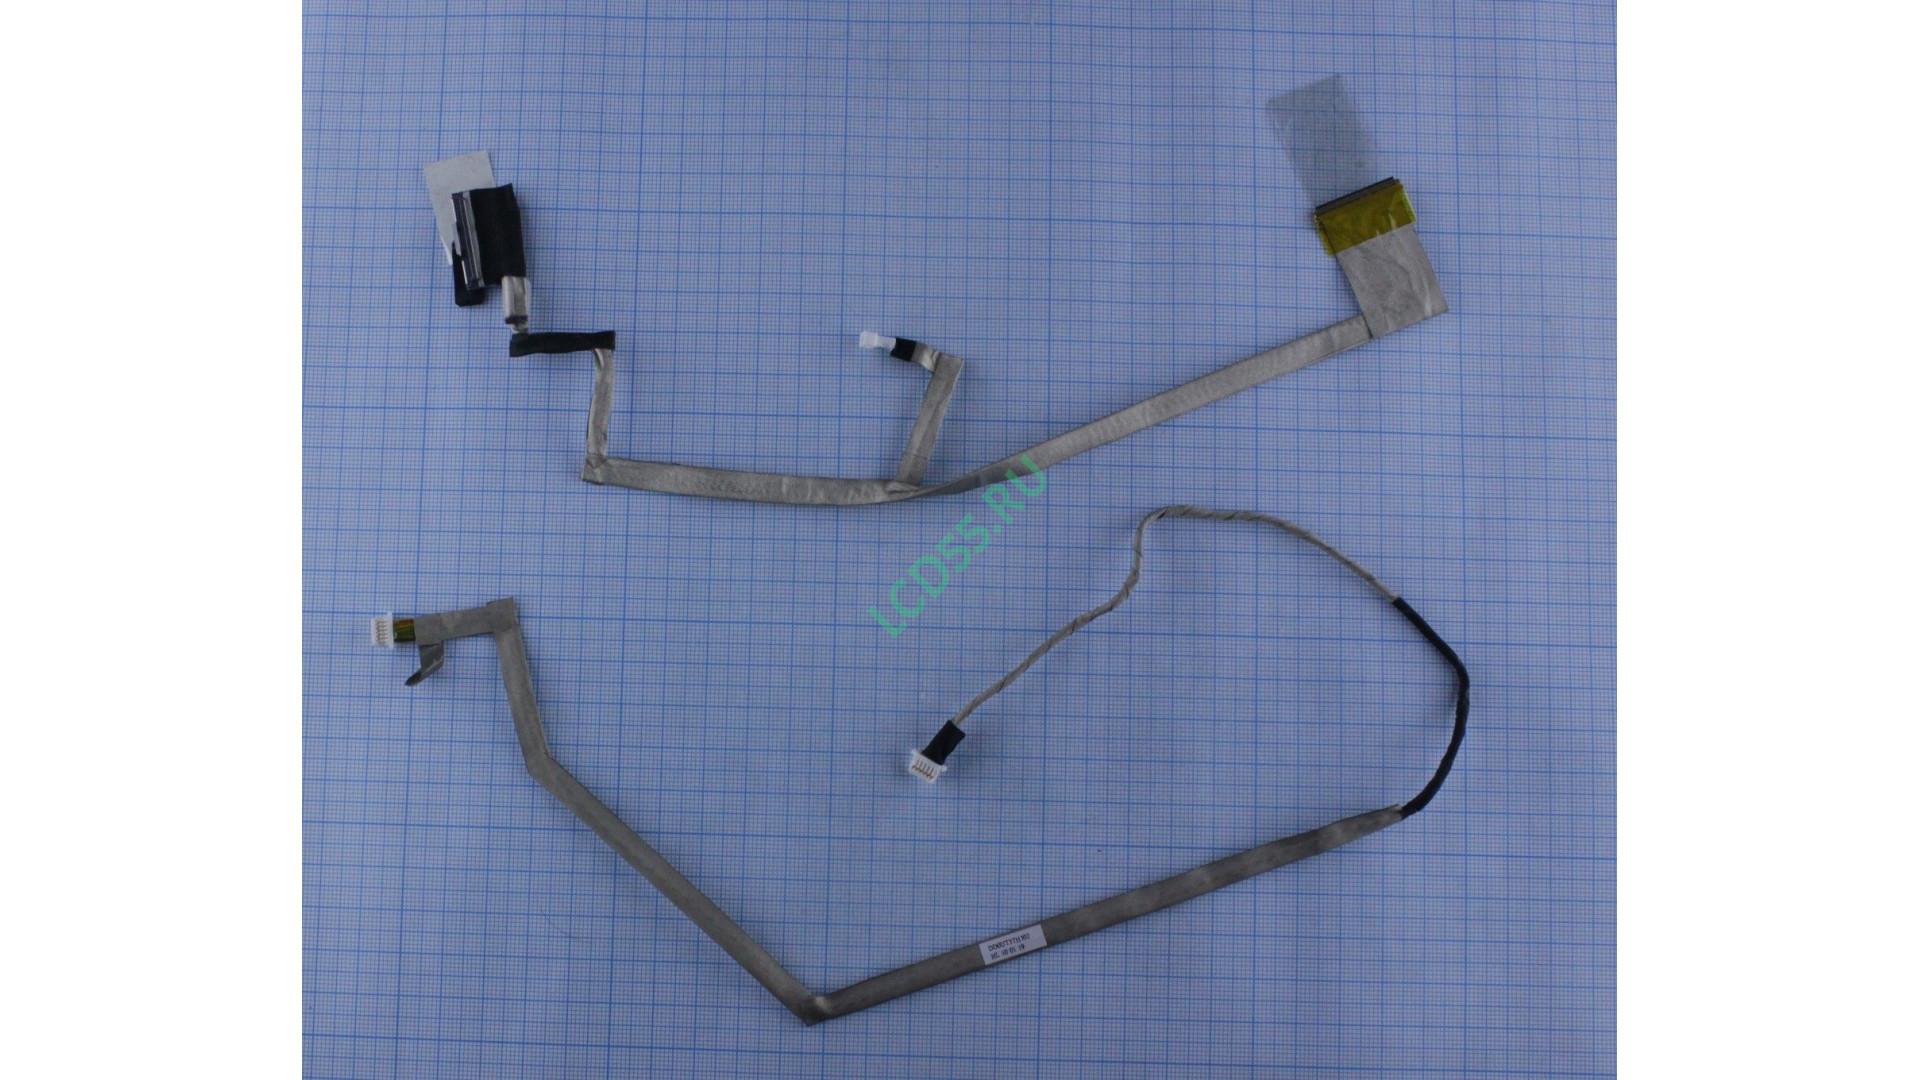 Шлейф матрицы HP Pavilion DV6-2000, DV6-1000, DV5-1000